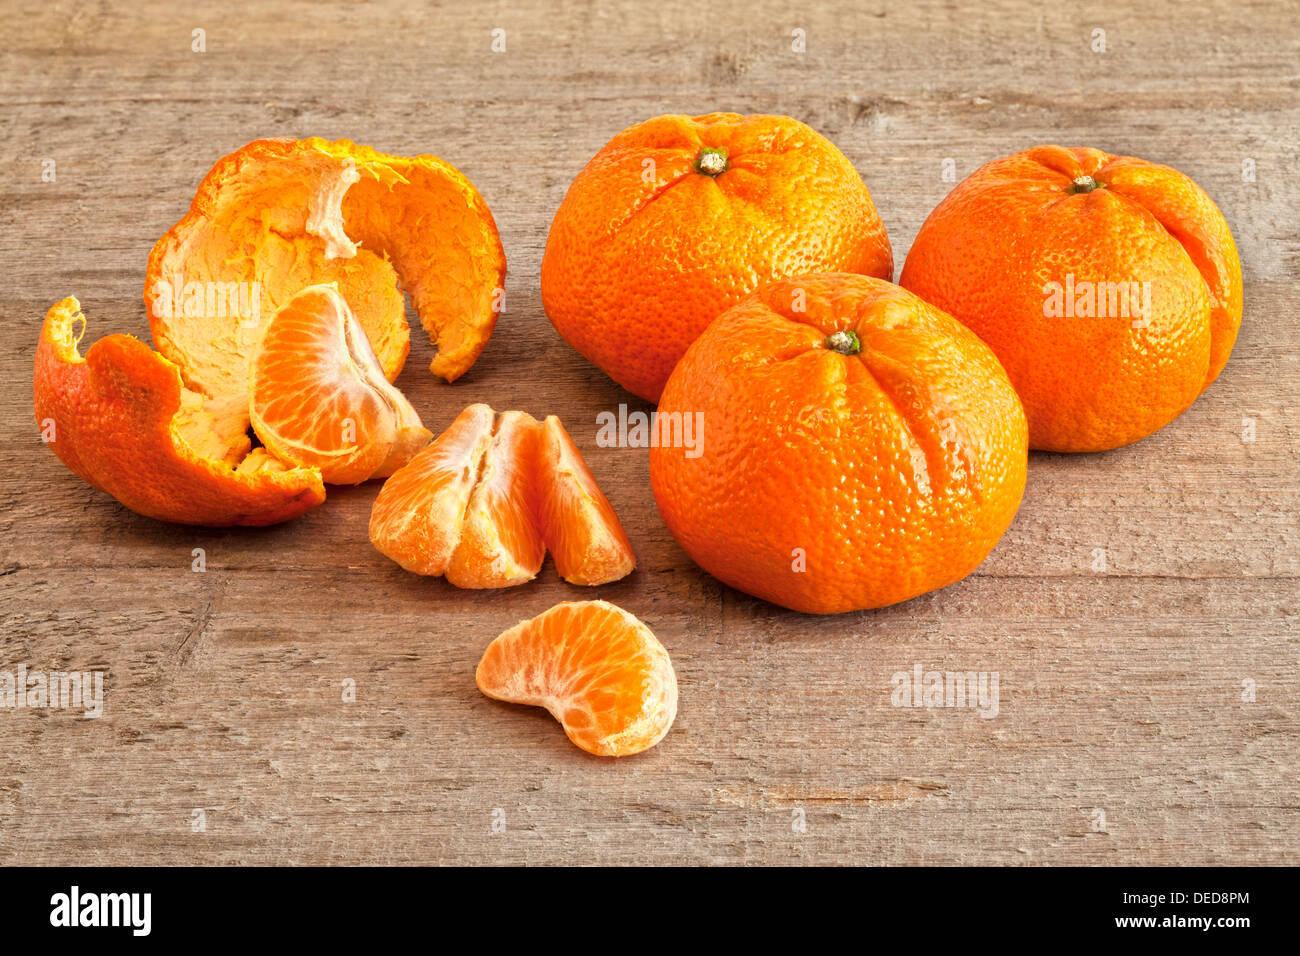 Mandarin Oranges - mandarin oranges on a rustic wooden surface, three whole, one peeled and segmented. - Stock Image